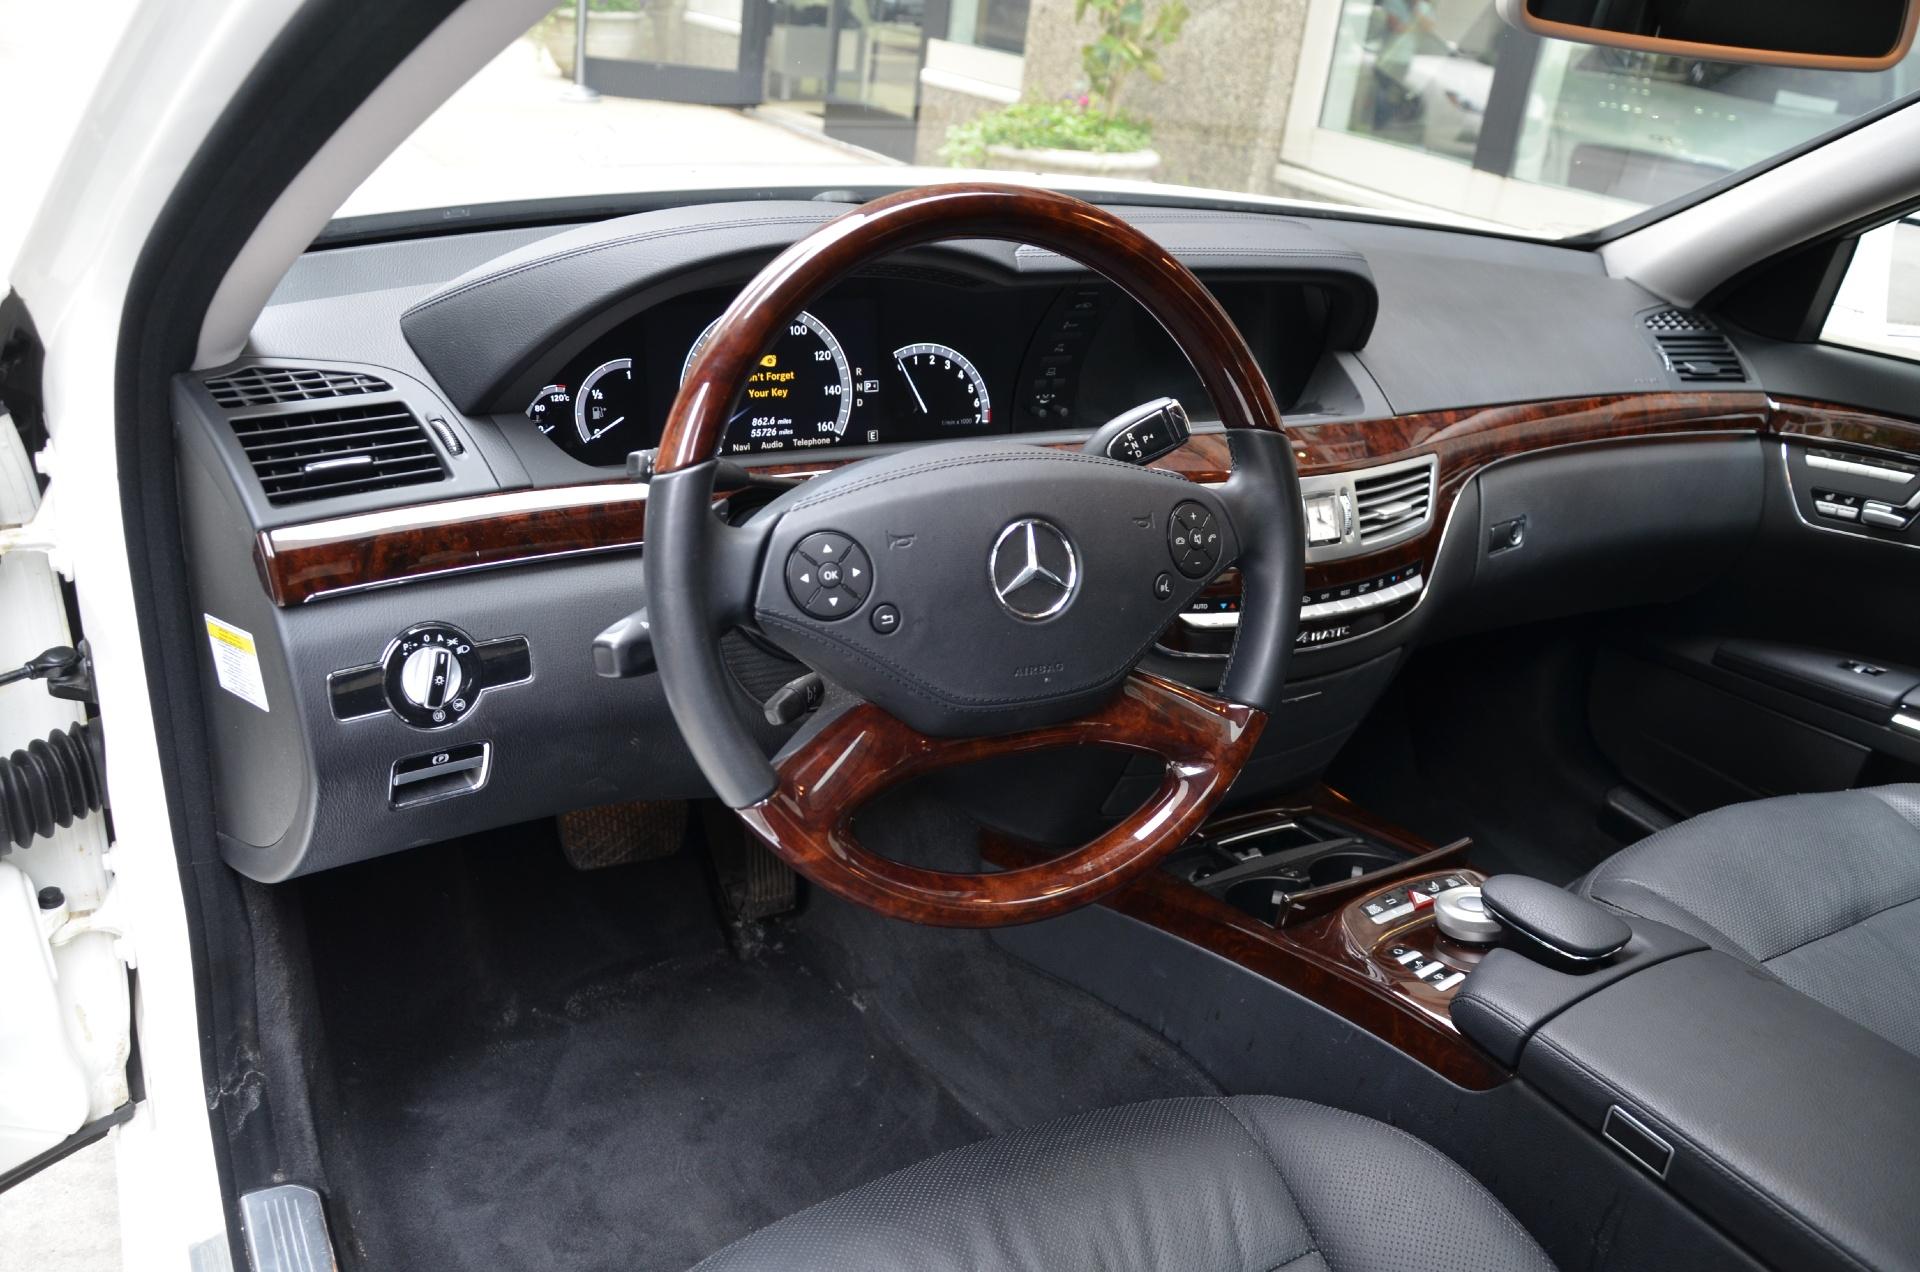 news class and mercedes s classaspx aspx benz sedan information image